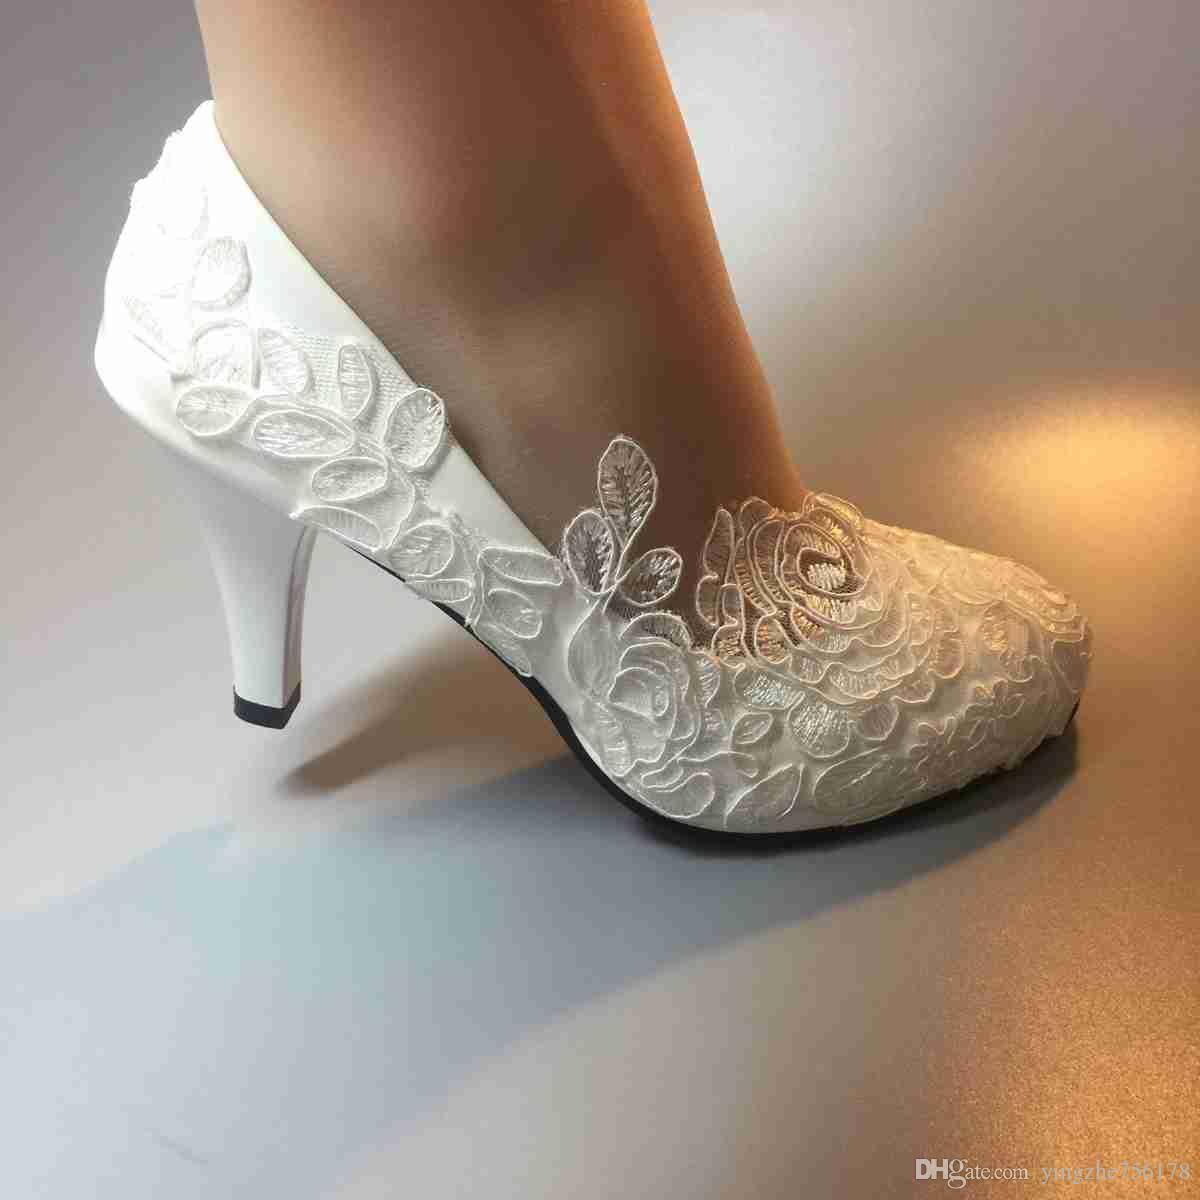 Mariage Ruban Acheter De Main Mode Chaussures Talon Blanc Femmes Qsrdht